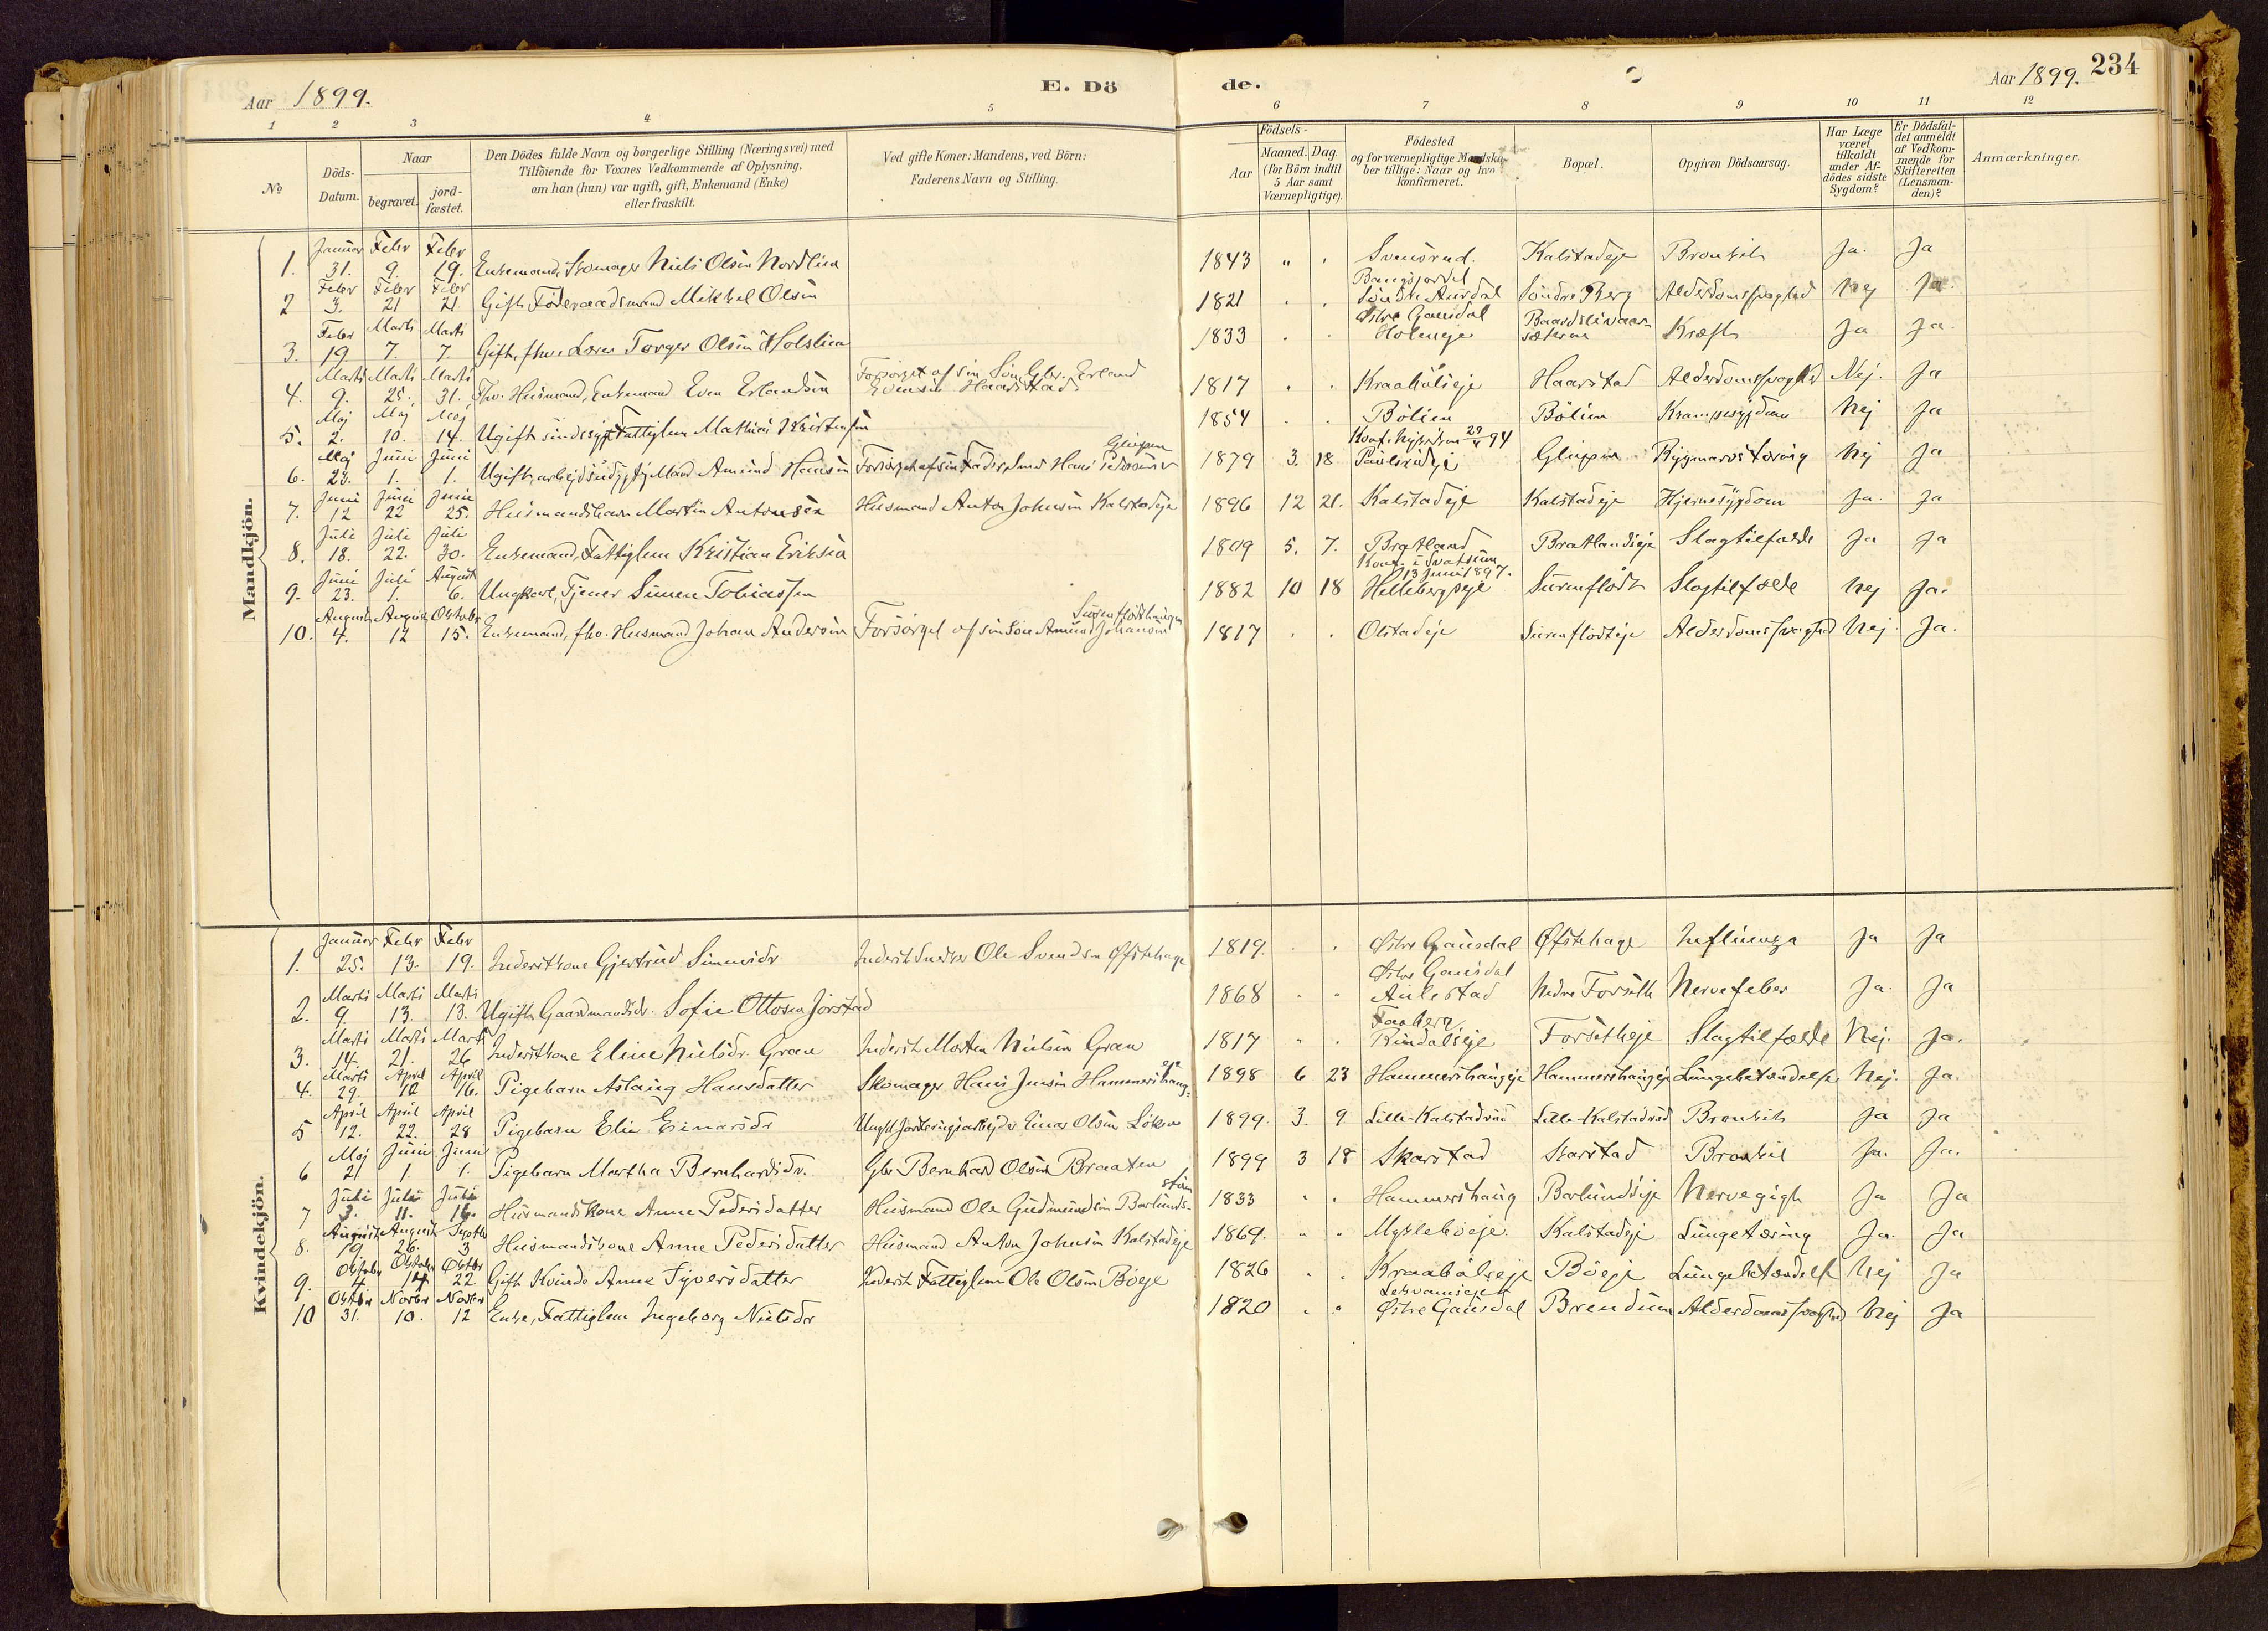 SAH, Vestre Gausdal prestekontor, Ministerialbok nr. 1, 1887-1914, s. 234